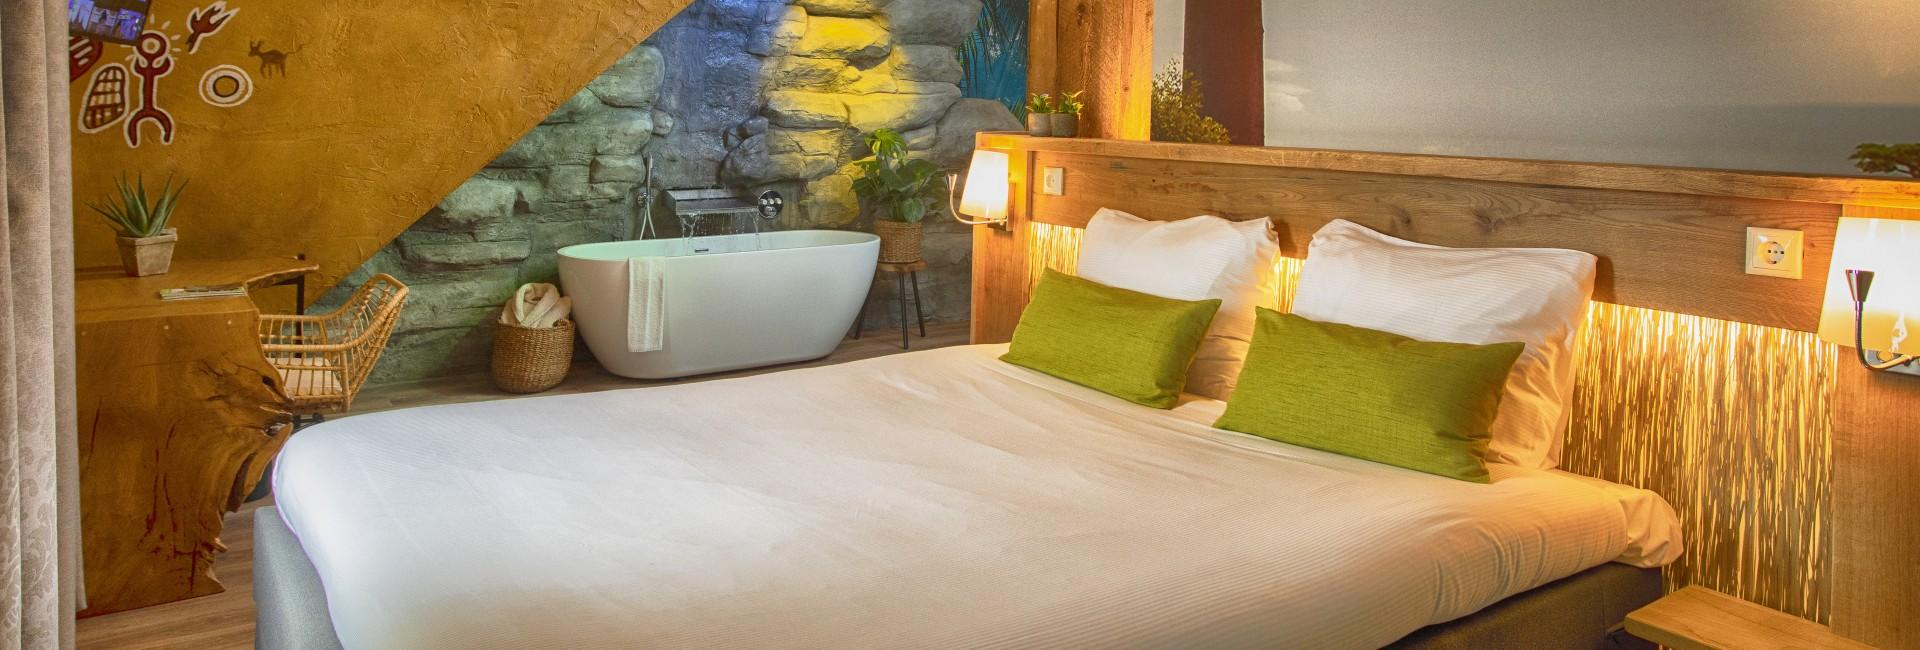 Hotel   Restaurant   Wellness   Lounge   Terrace